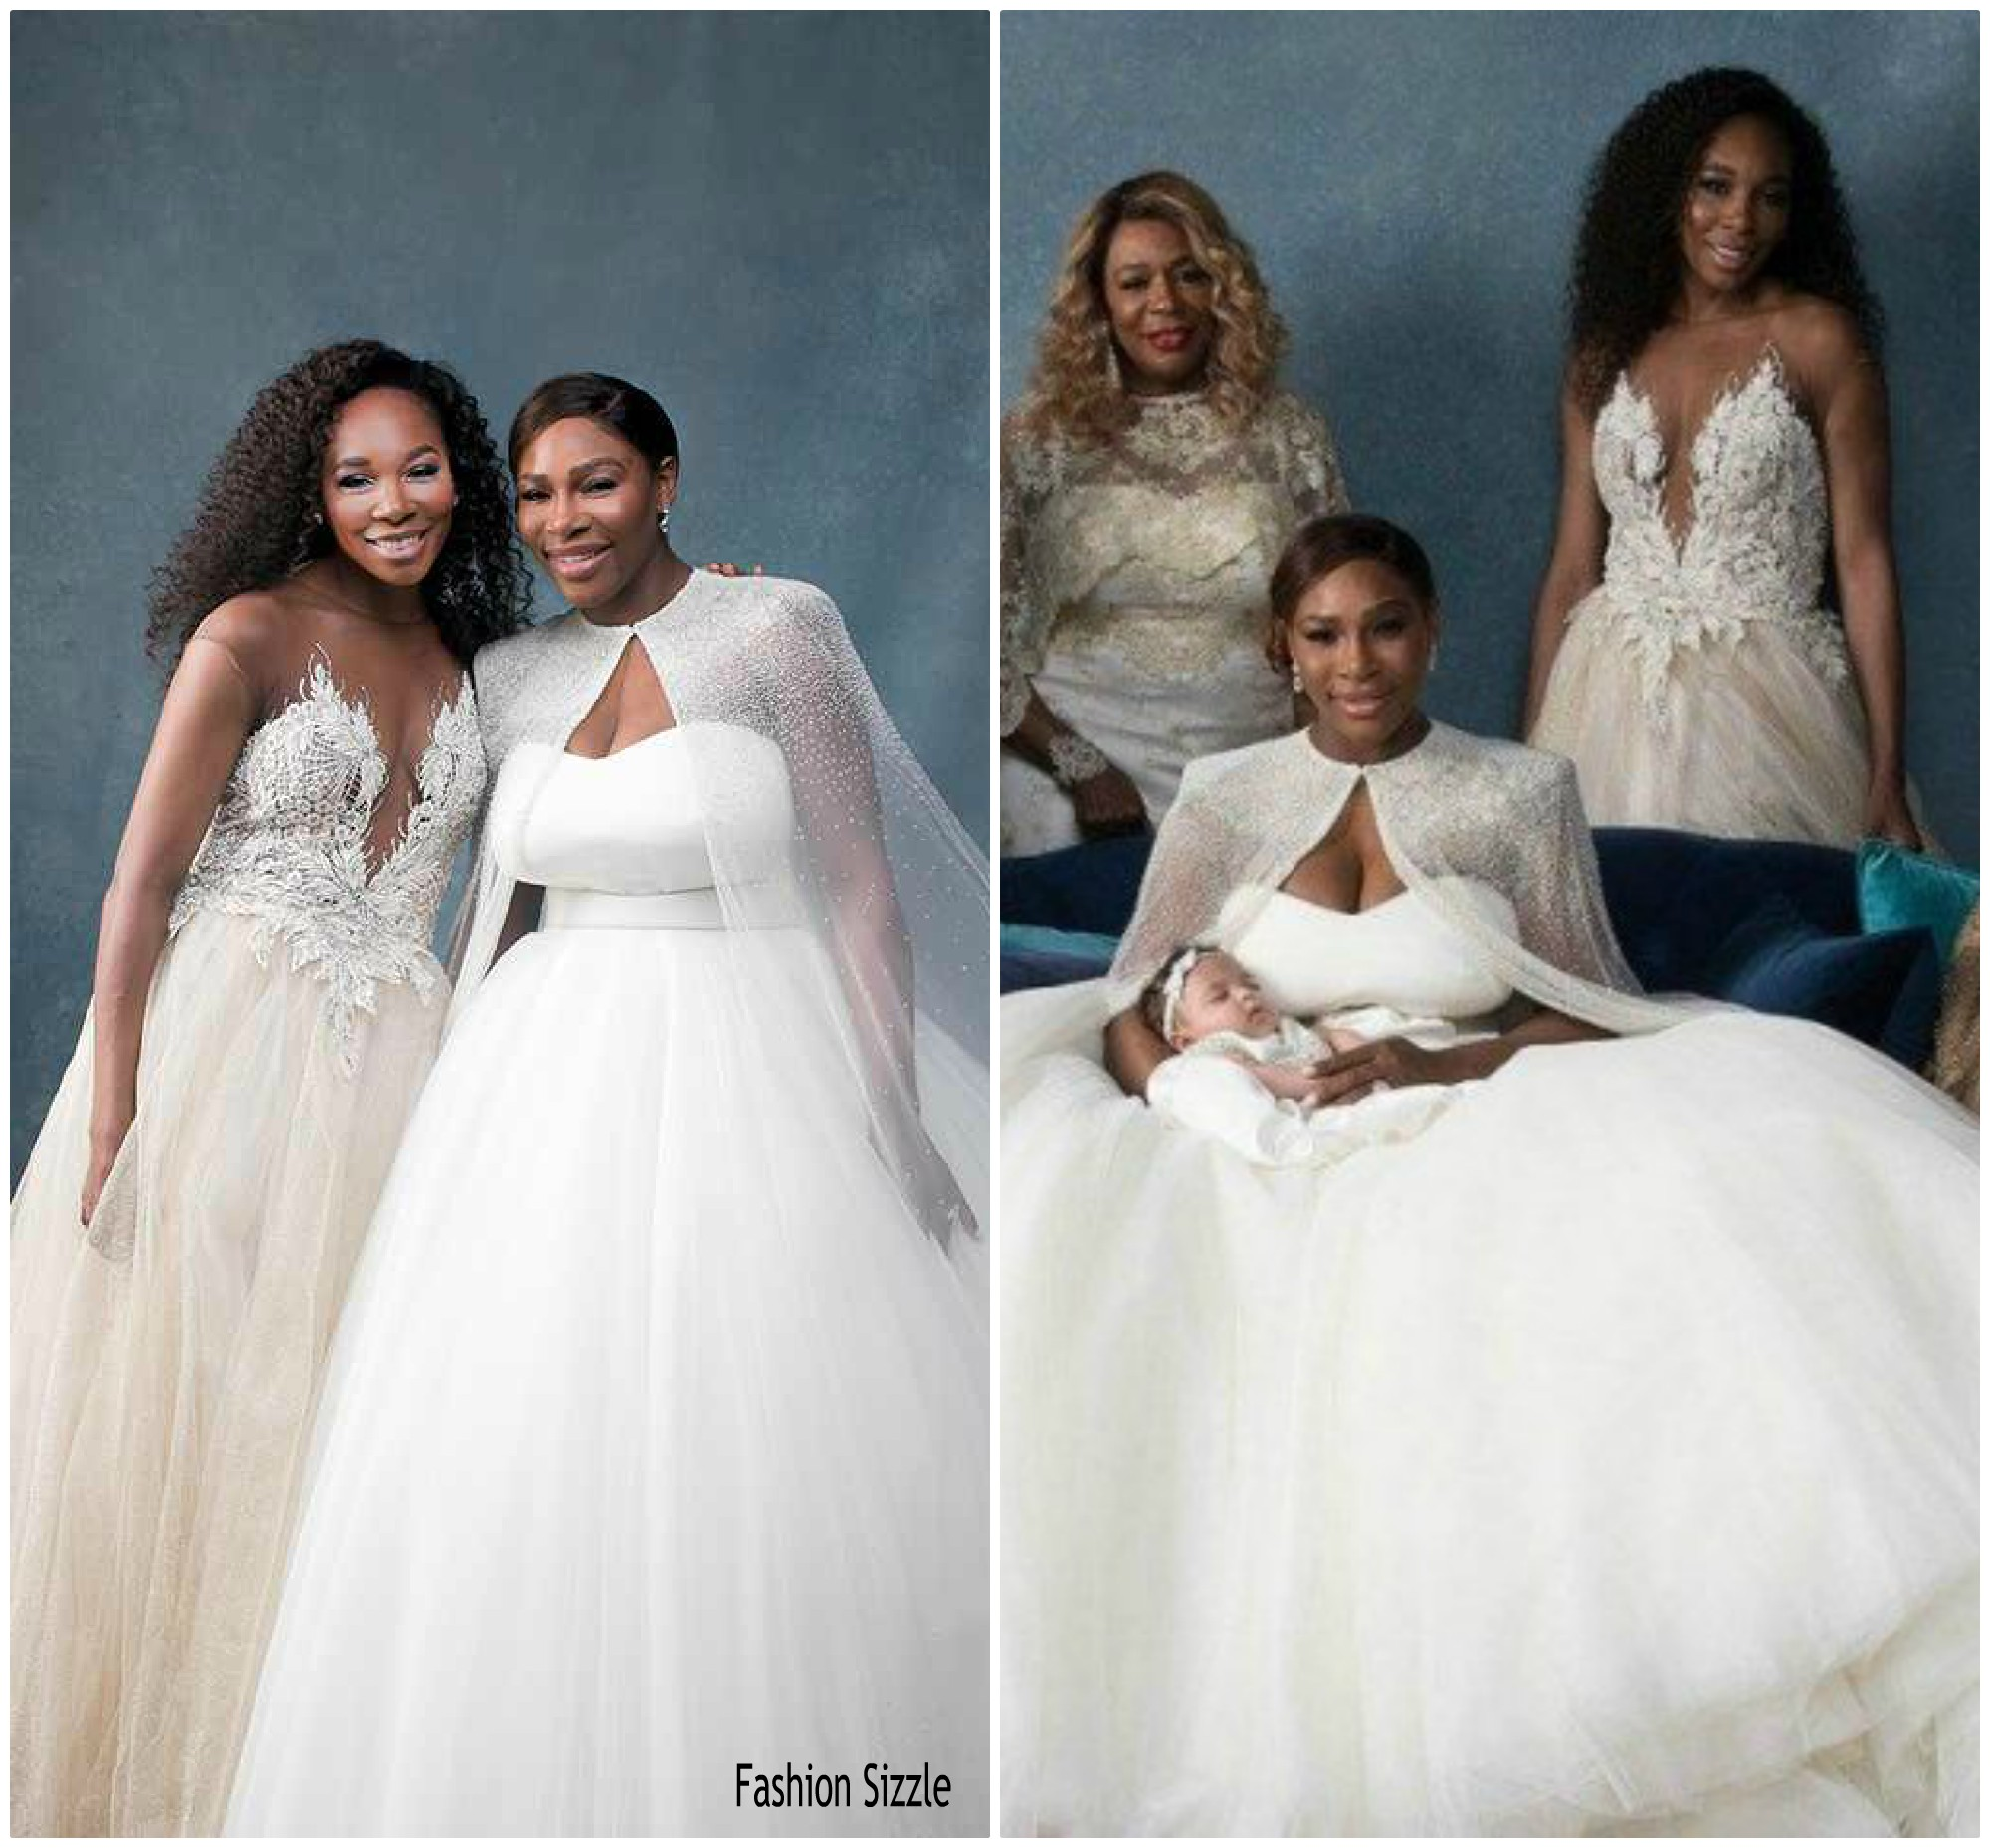 venus-williams-in-custom-galia-lahav-serena-williams-wedding